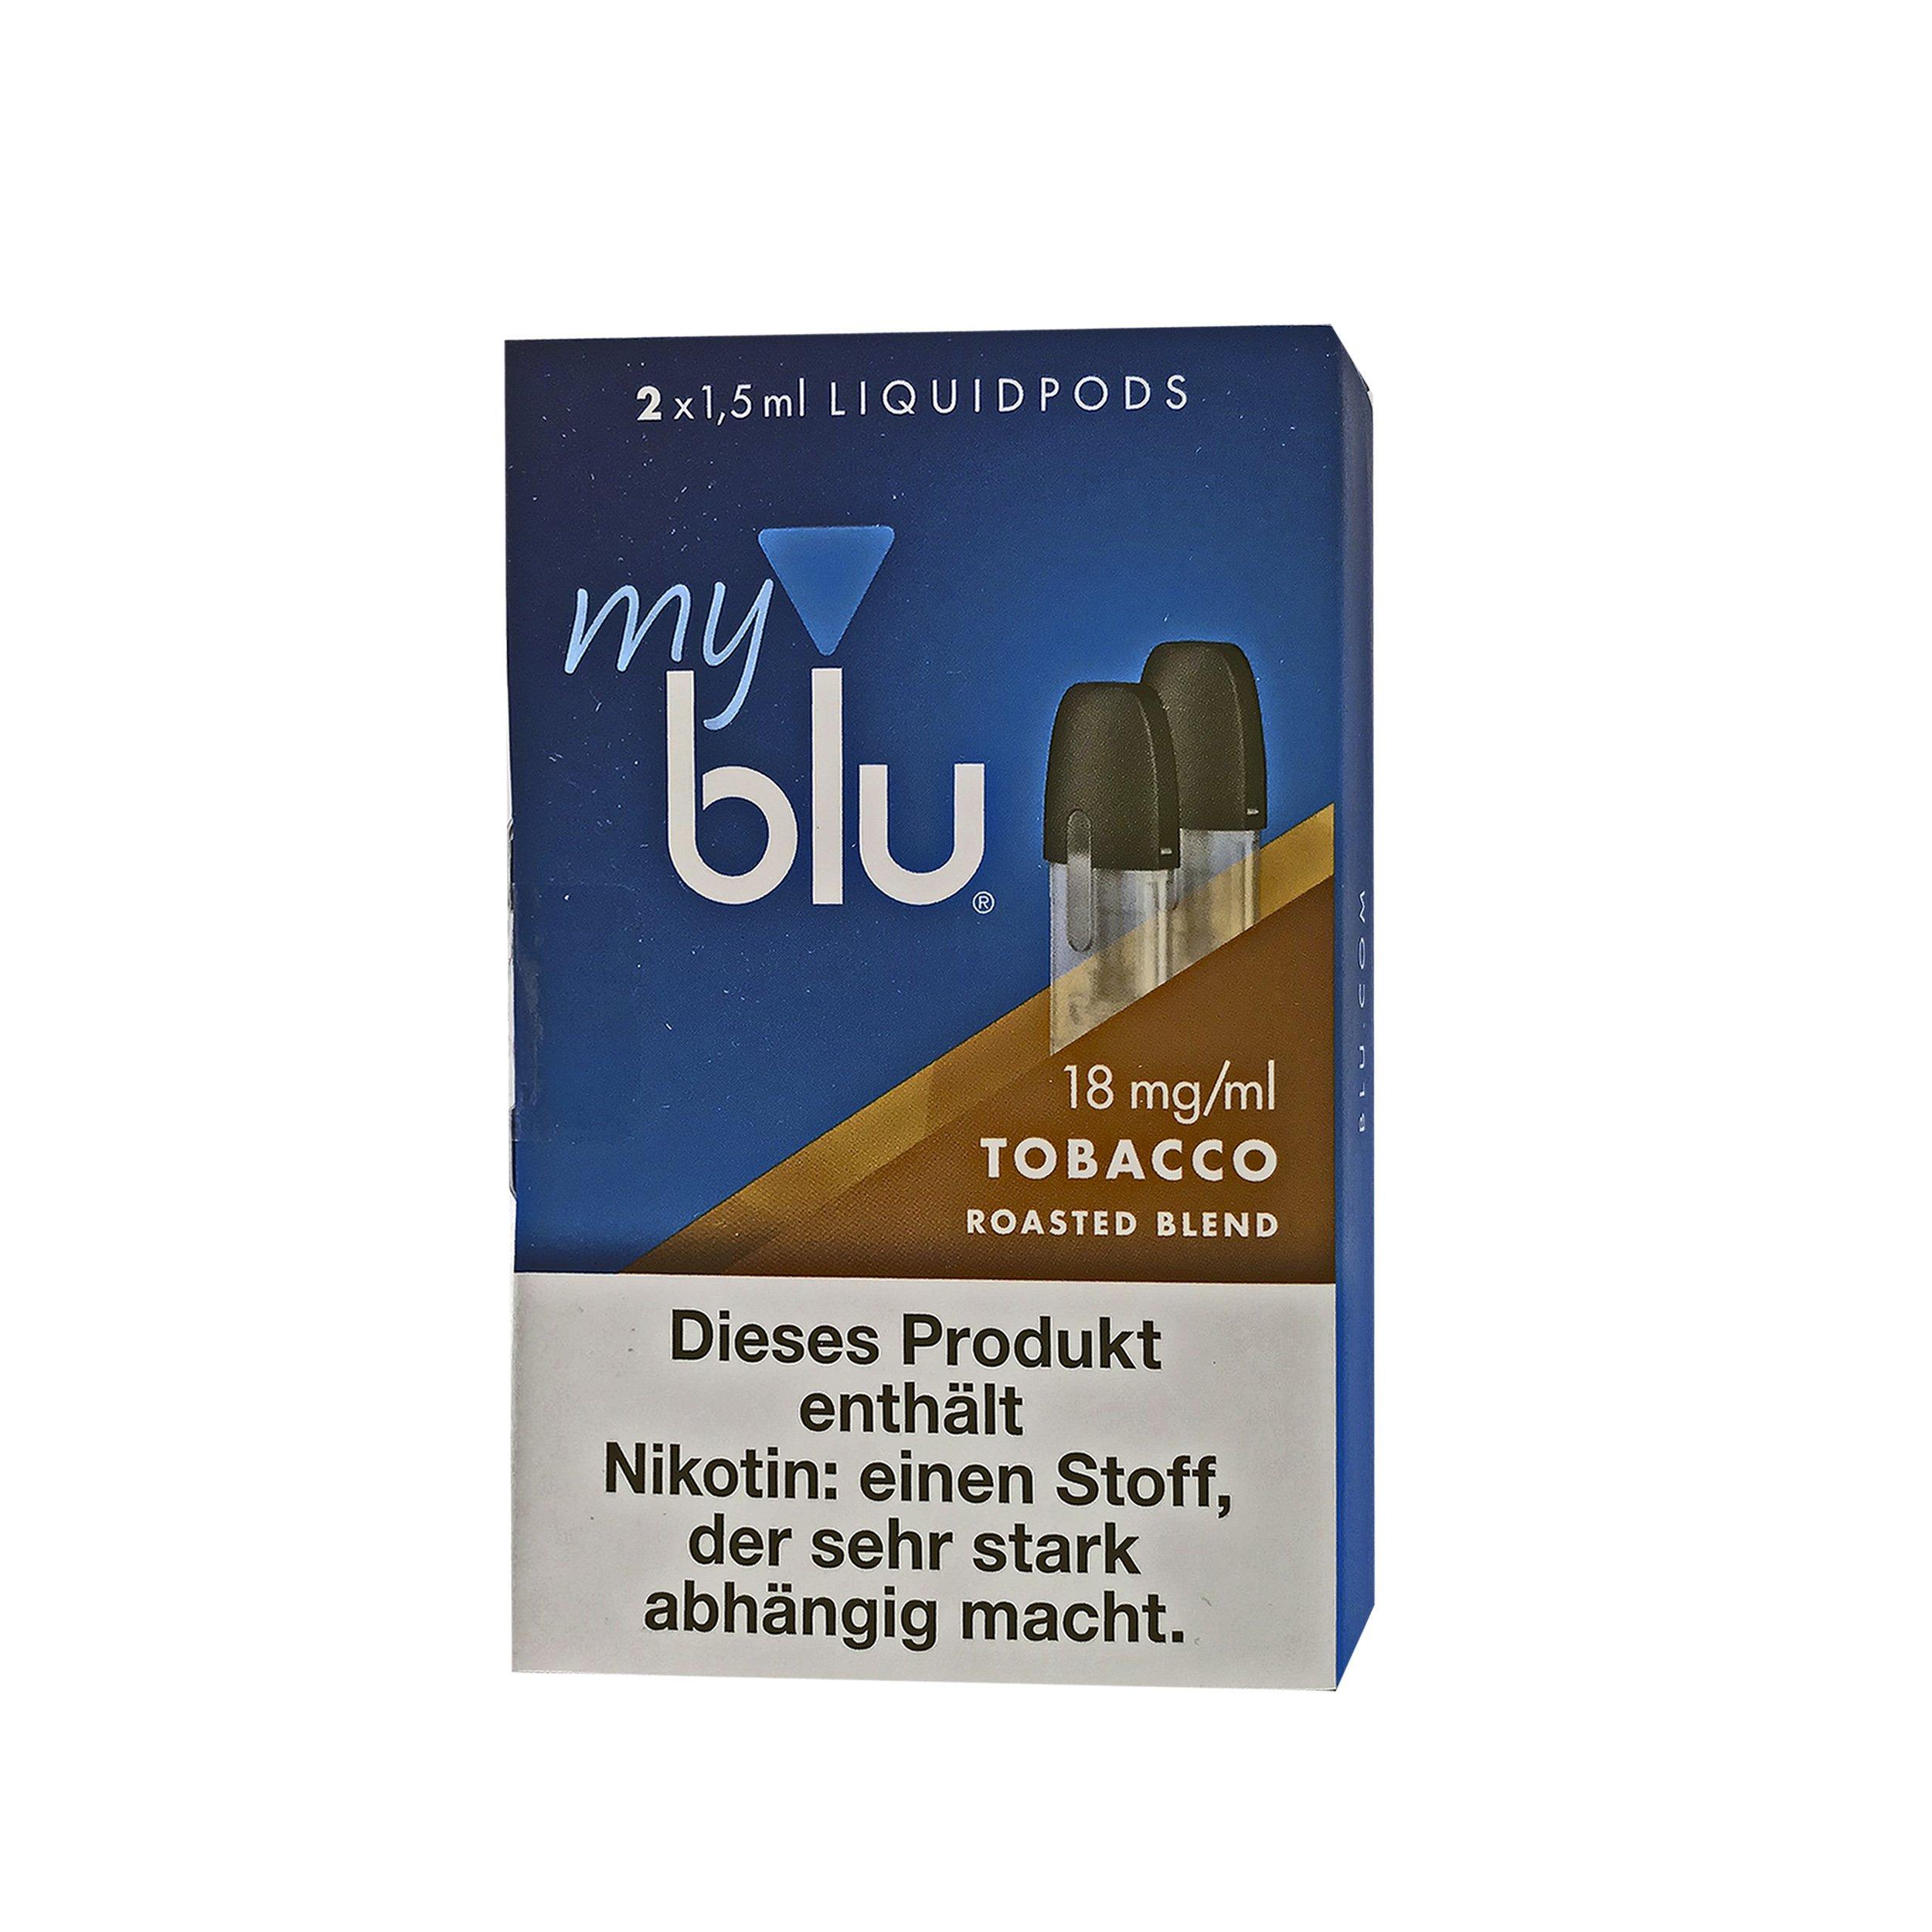 My Blu Liquid Pods Tobacco Roasted Blend 18 mg/ml Nikotin